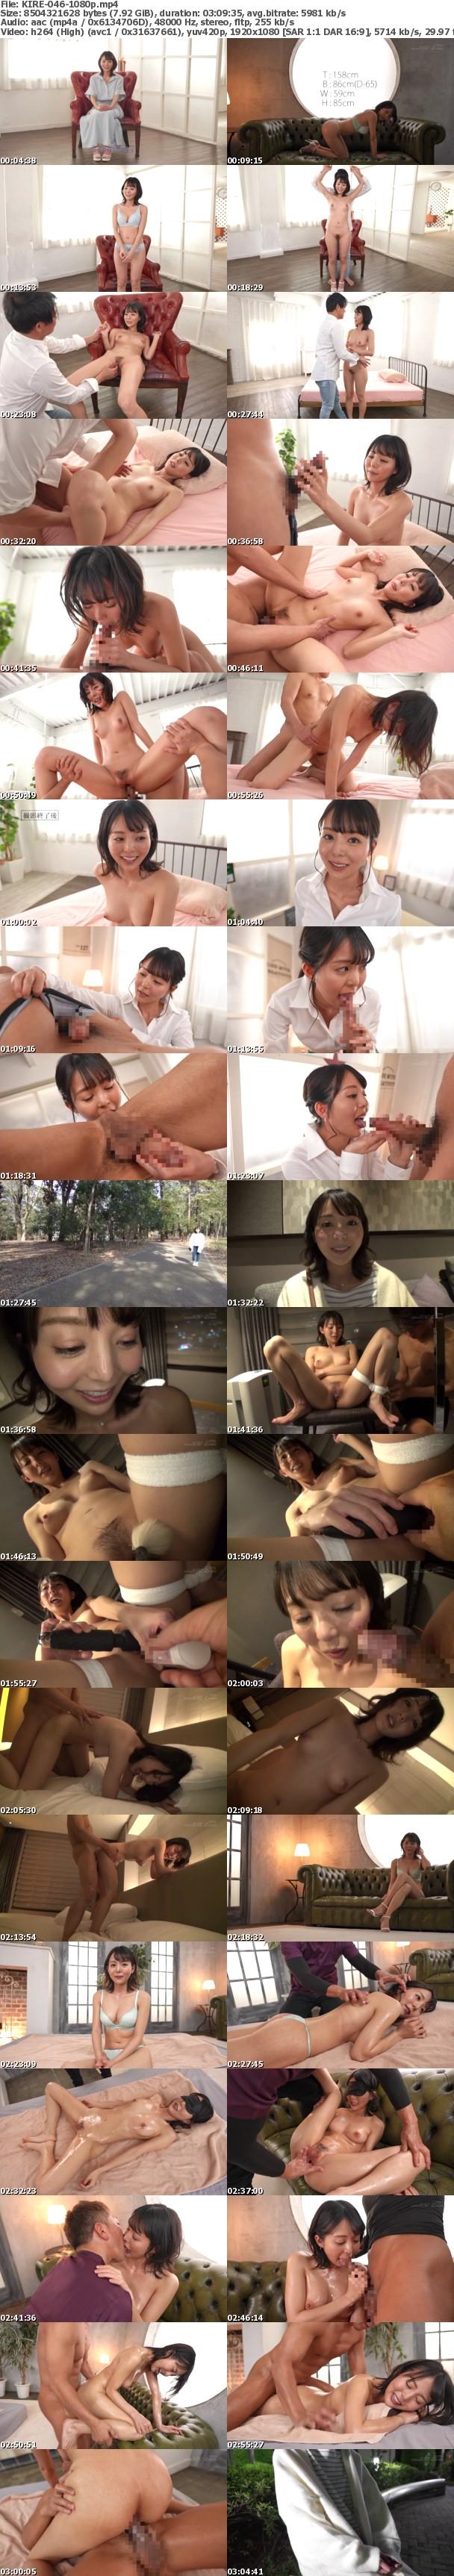 (Full HD) KIRE-046 【数量限定】セックスで火照る敏感すぎるカラダ 現役カフェ店員 岡田ひなの 27歳 AV DEBUT パンティと写真付き